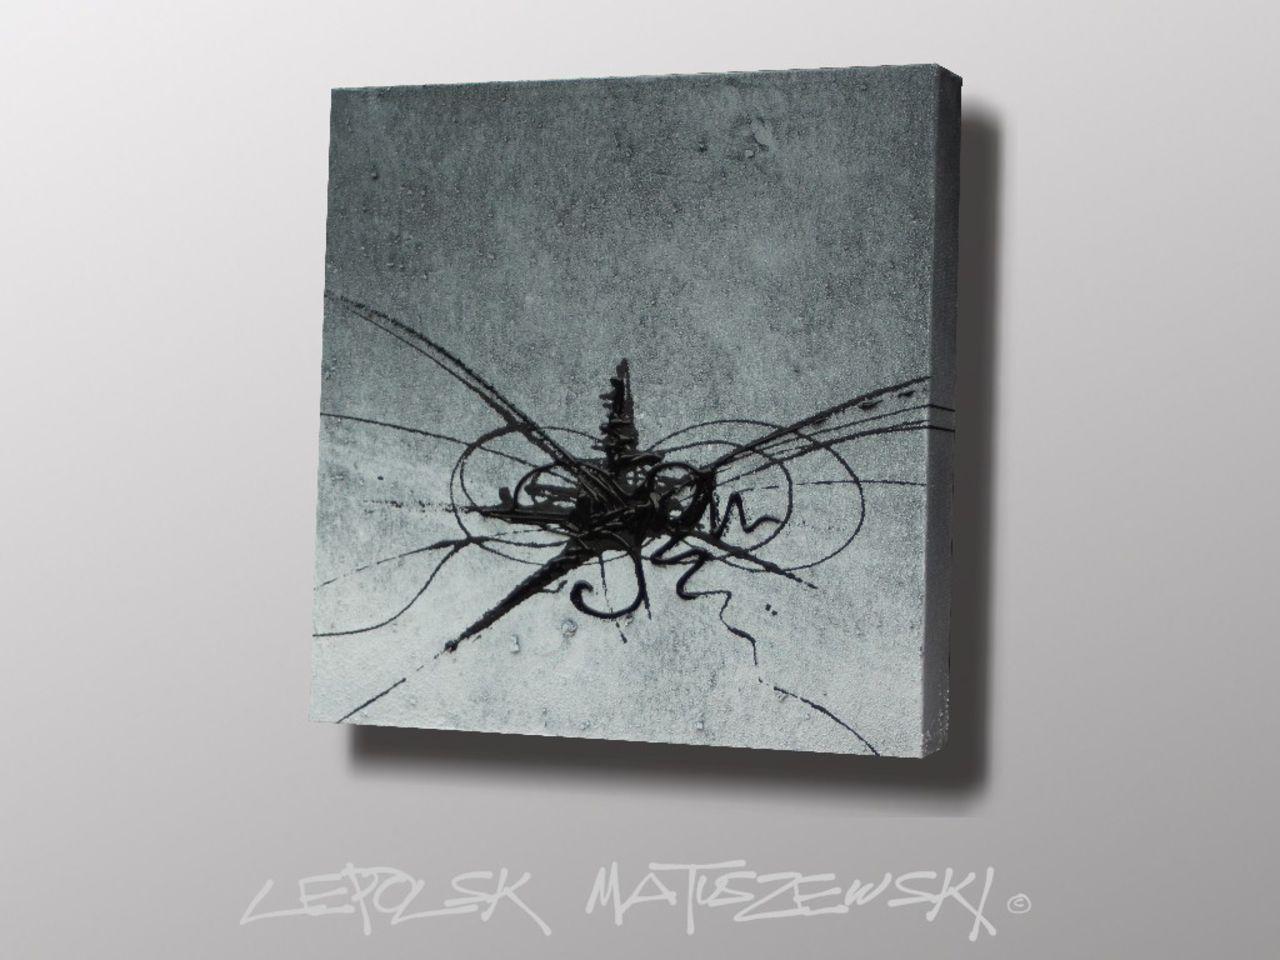 MISTER K  (Lepolsk Matuszewski) BLACK STAR  de Lepolsk  Matuszewski